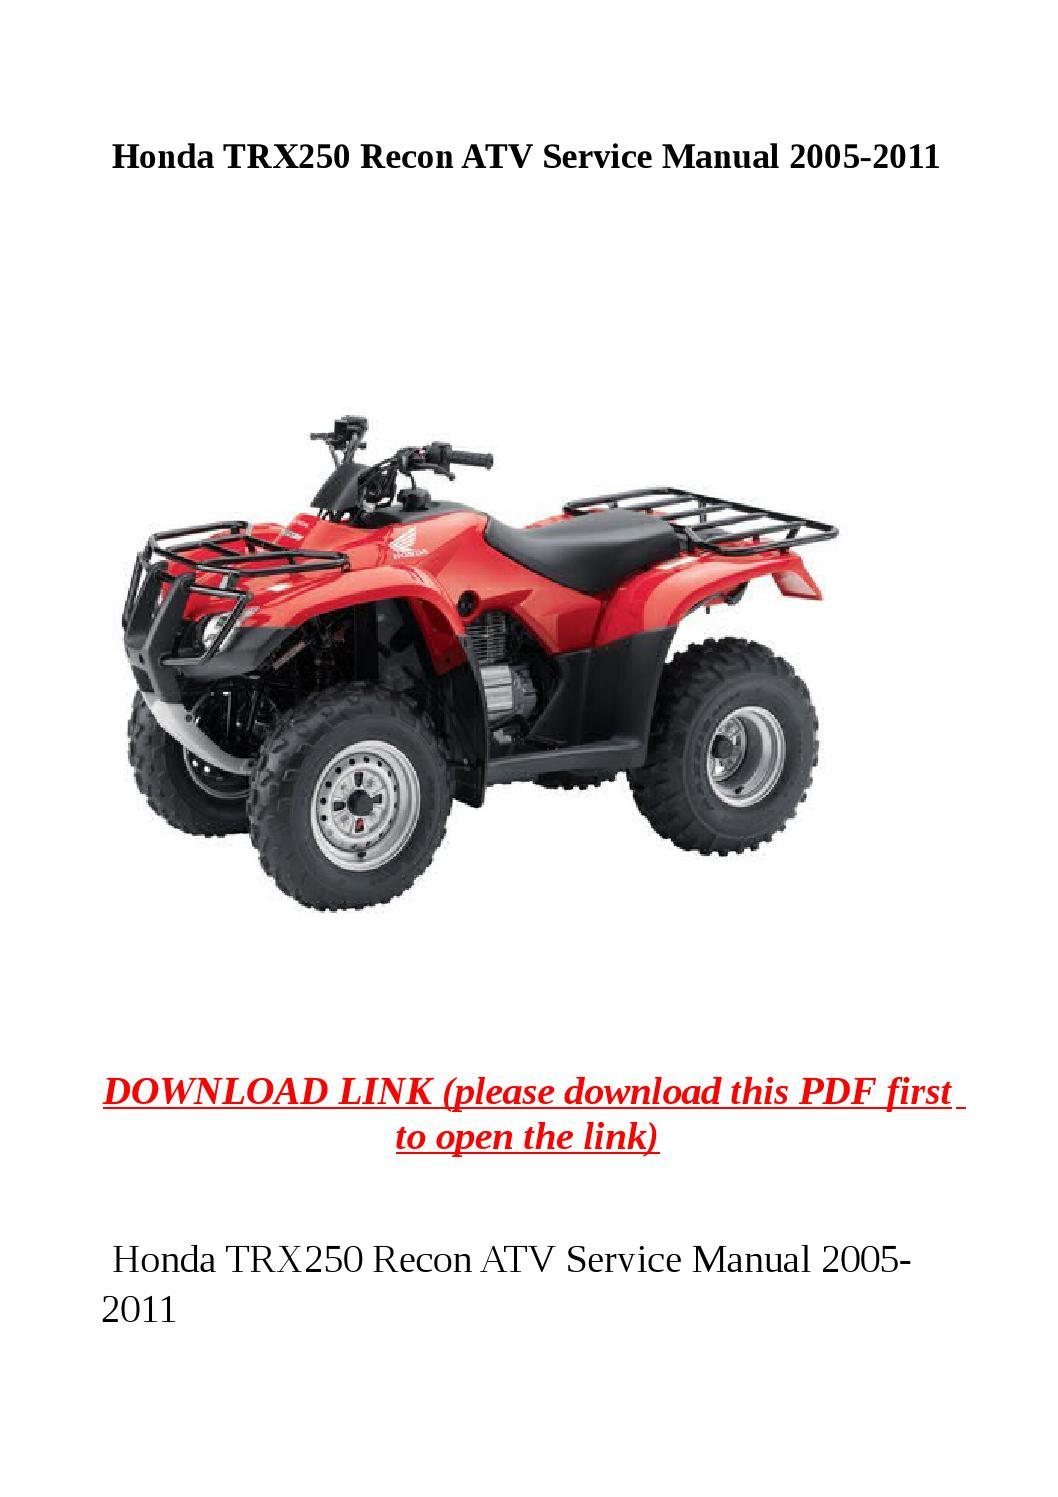 Honda Trx250 Recon Atv Service Manual 2005 2011 By Yhkj